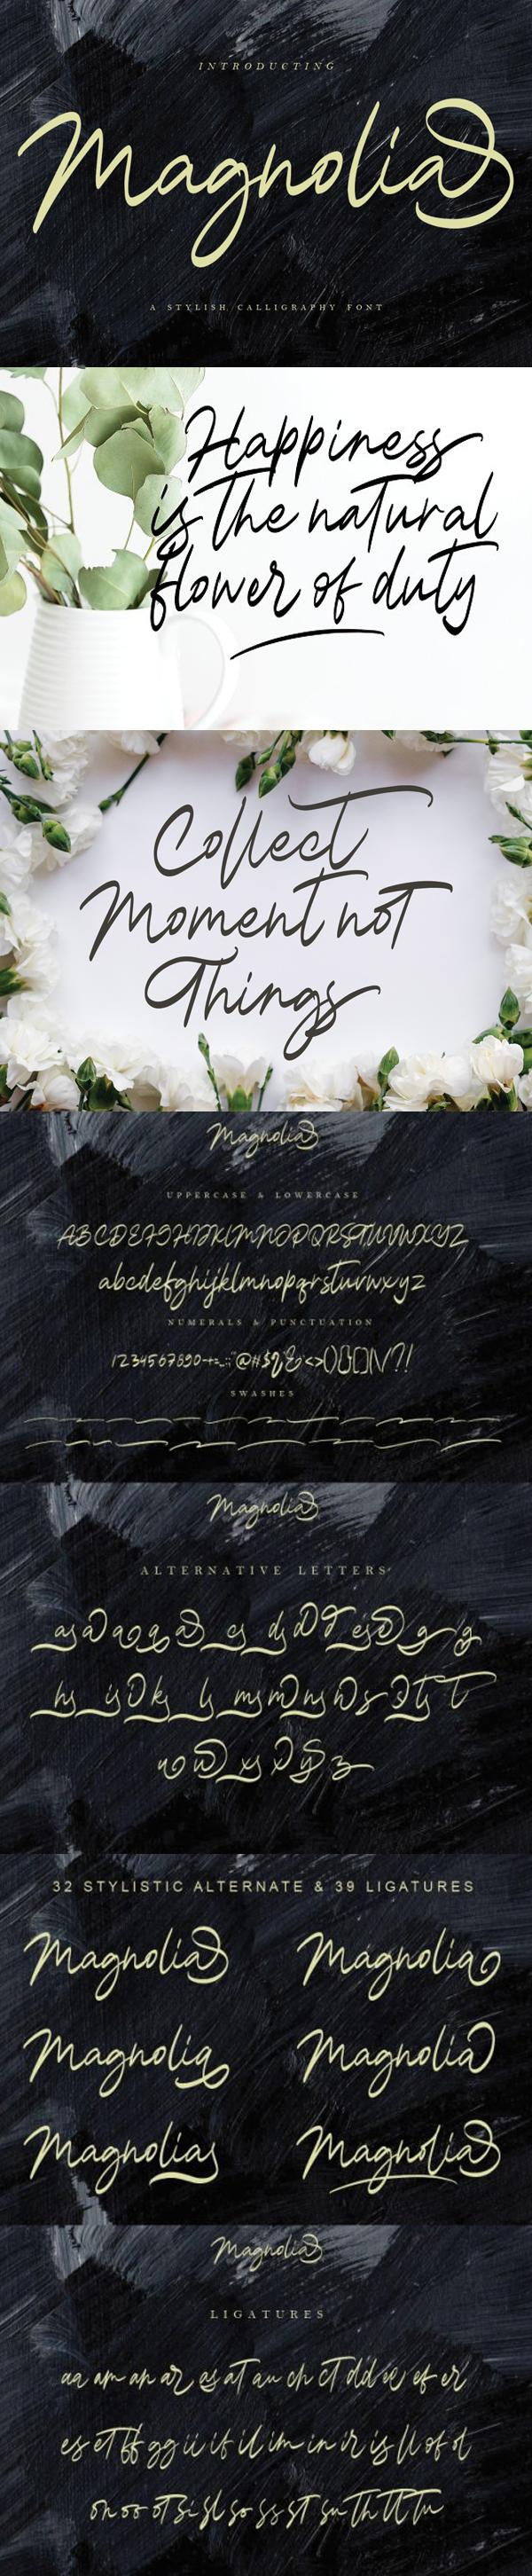 Magnolia Calligraphy Free Font